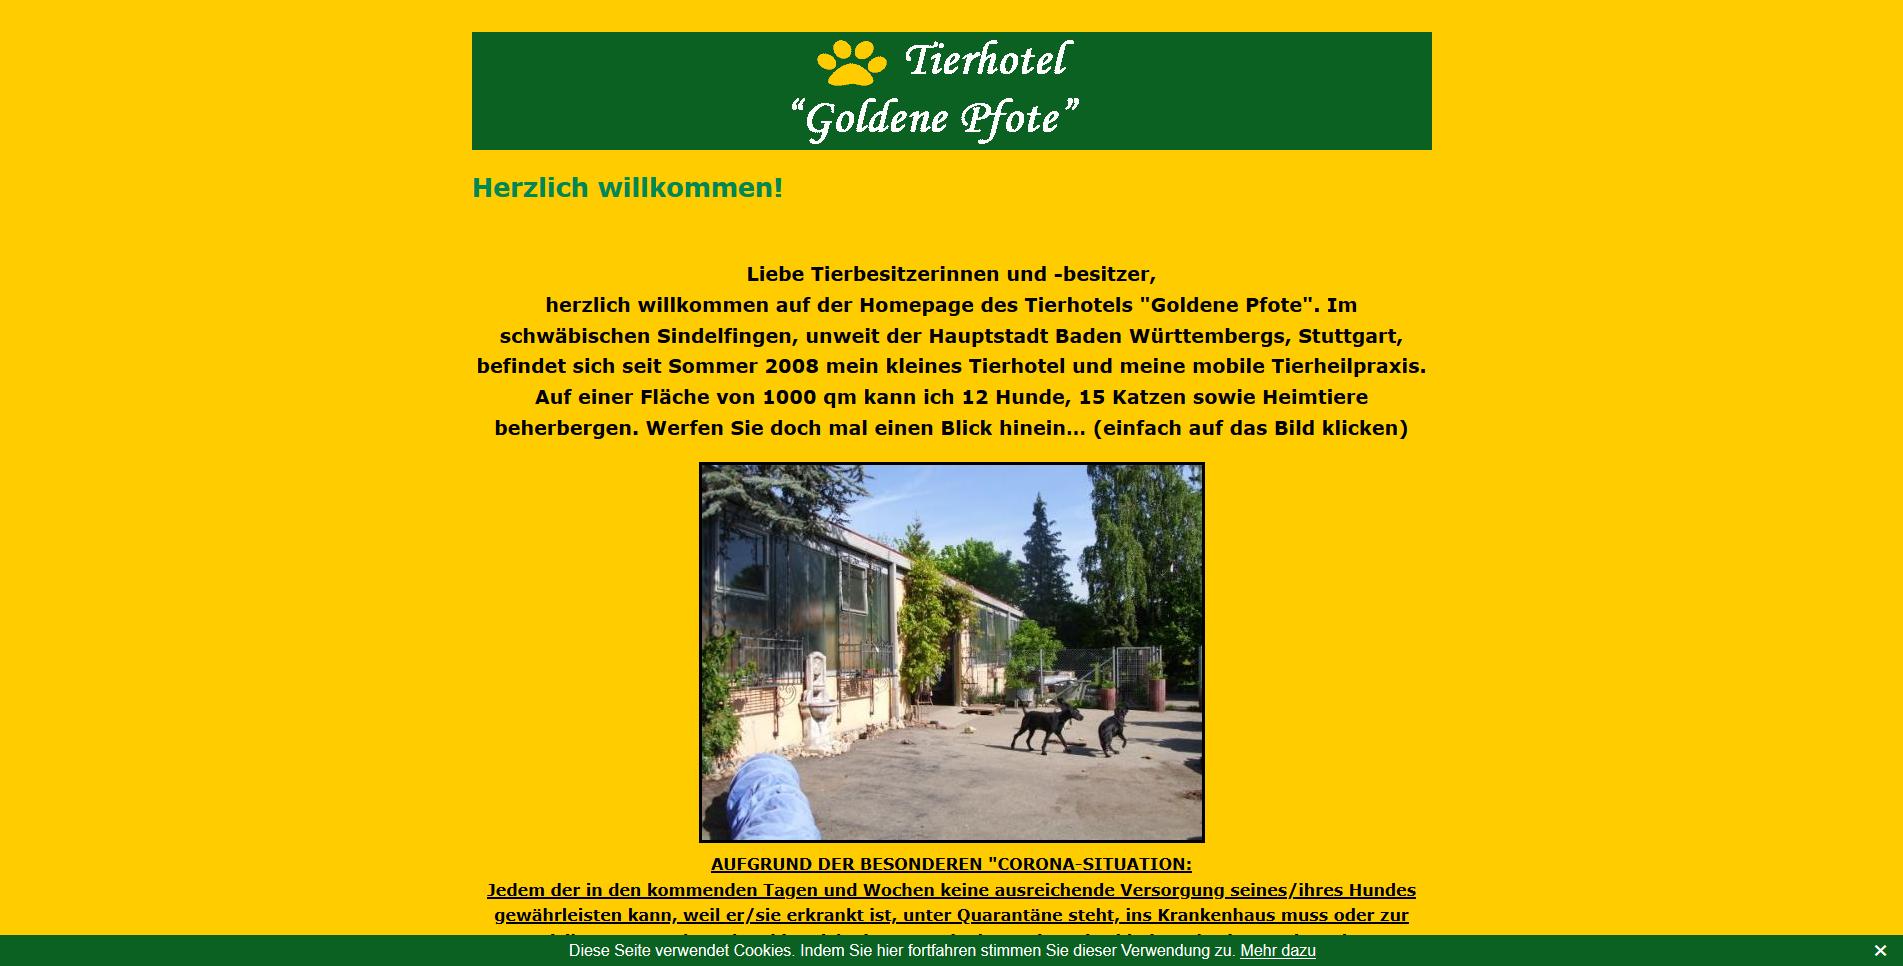 Tierhotel Goldene Pfote